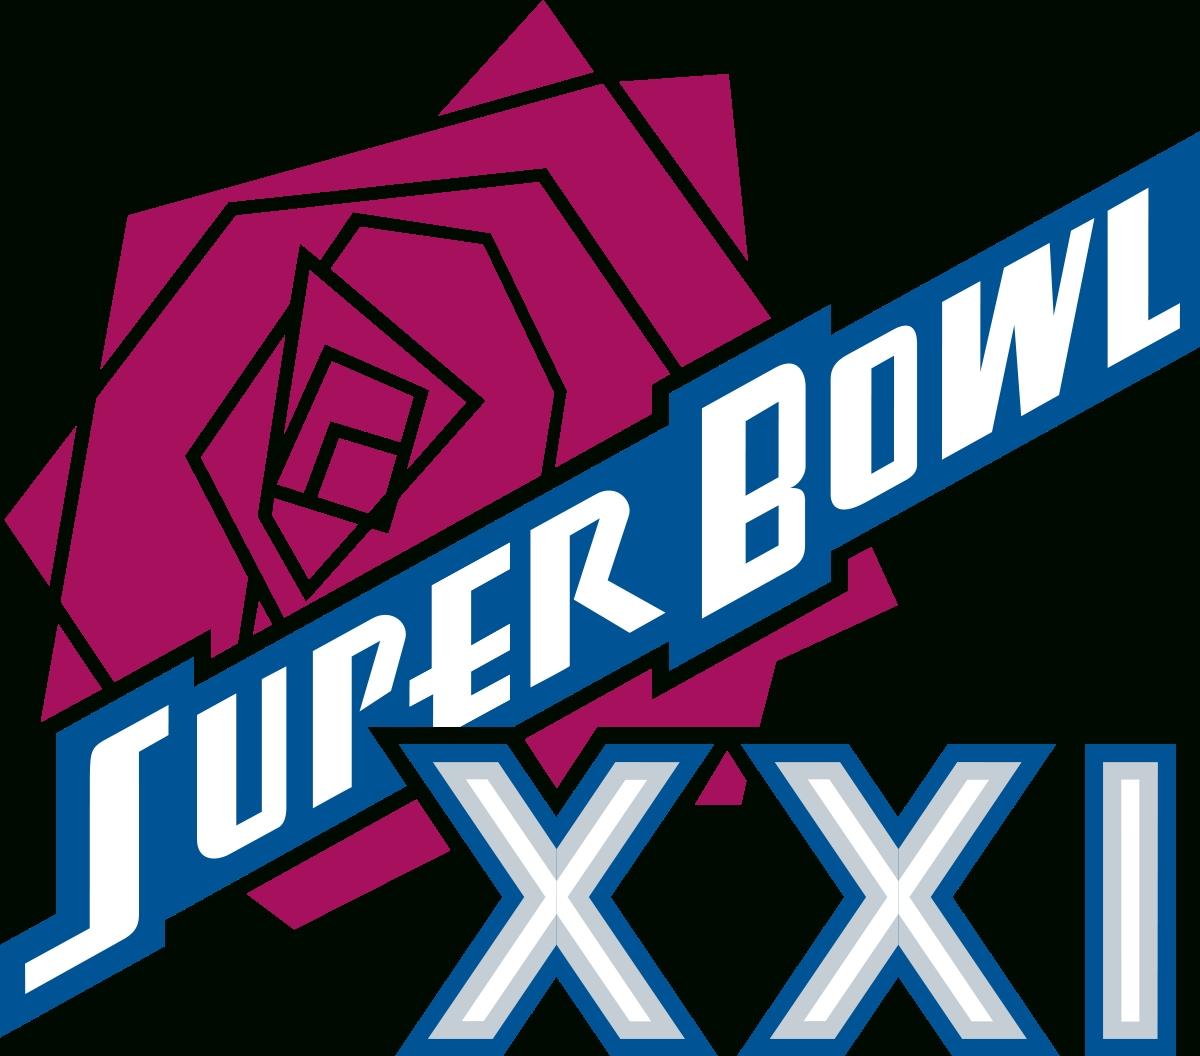 Super Bowl Xxi - Wikipedia inside Super Bowl 53 Mvp Vote Text Number